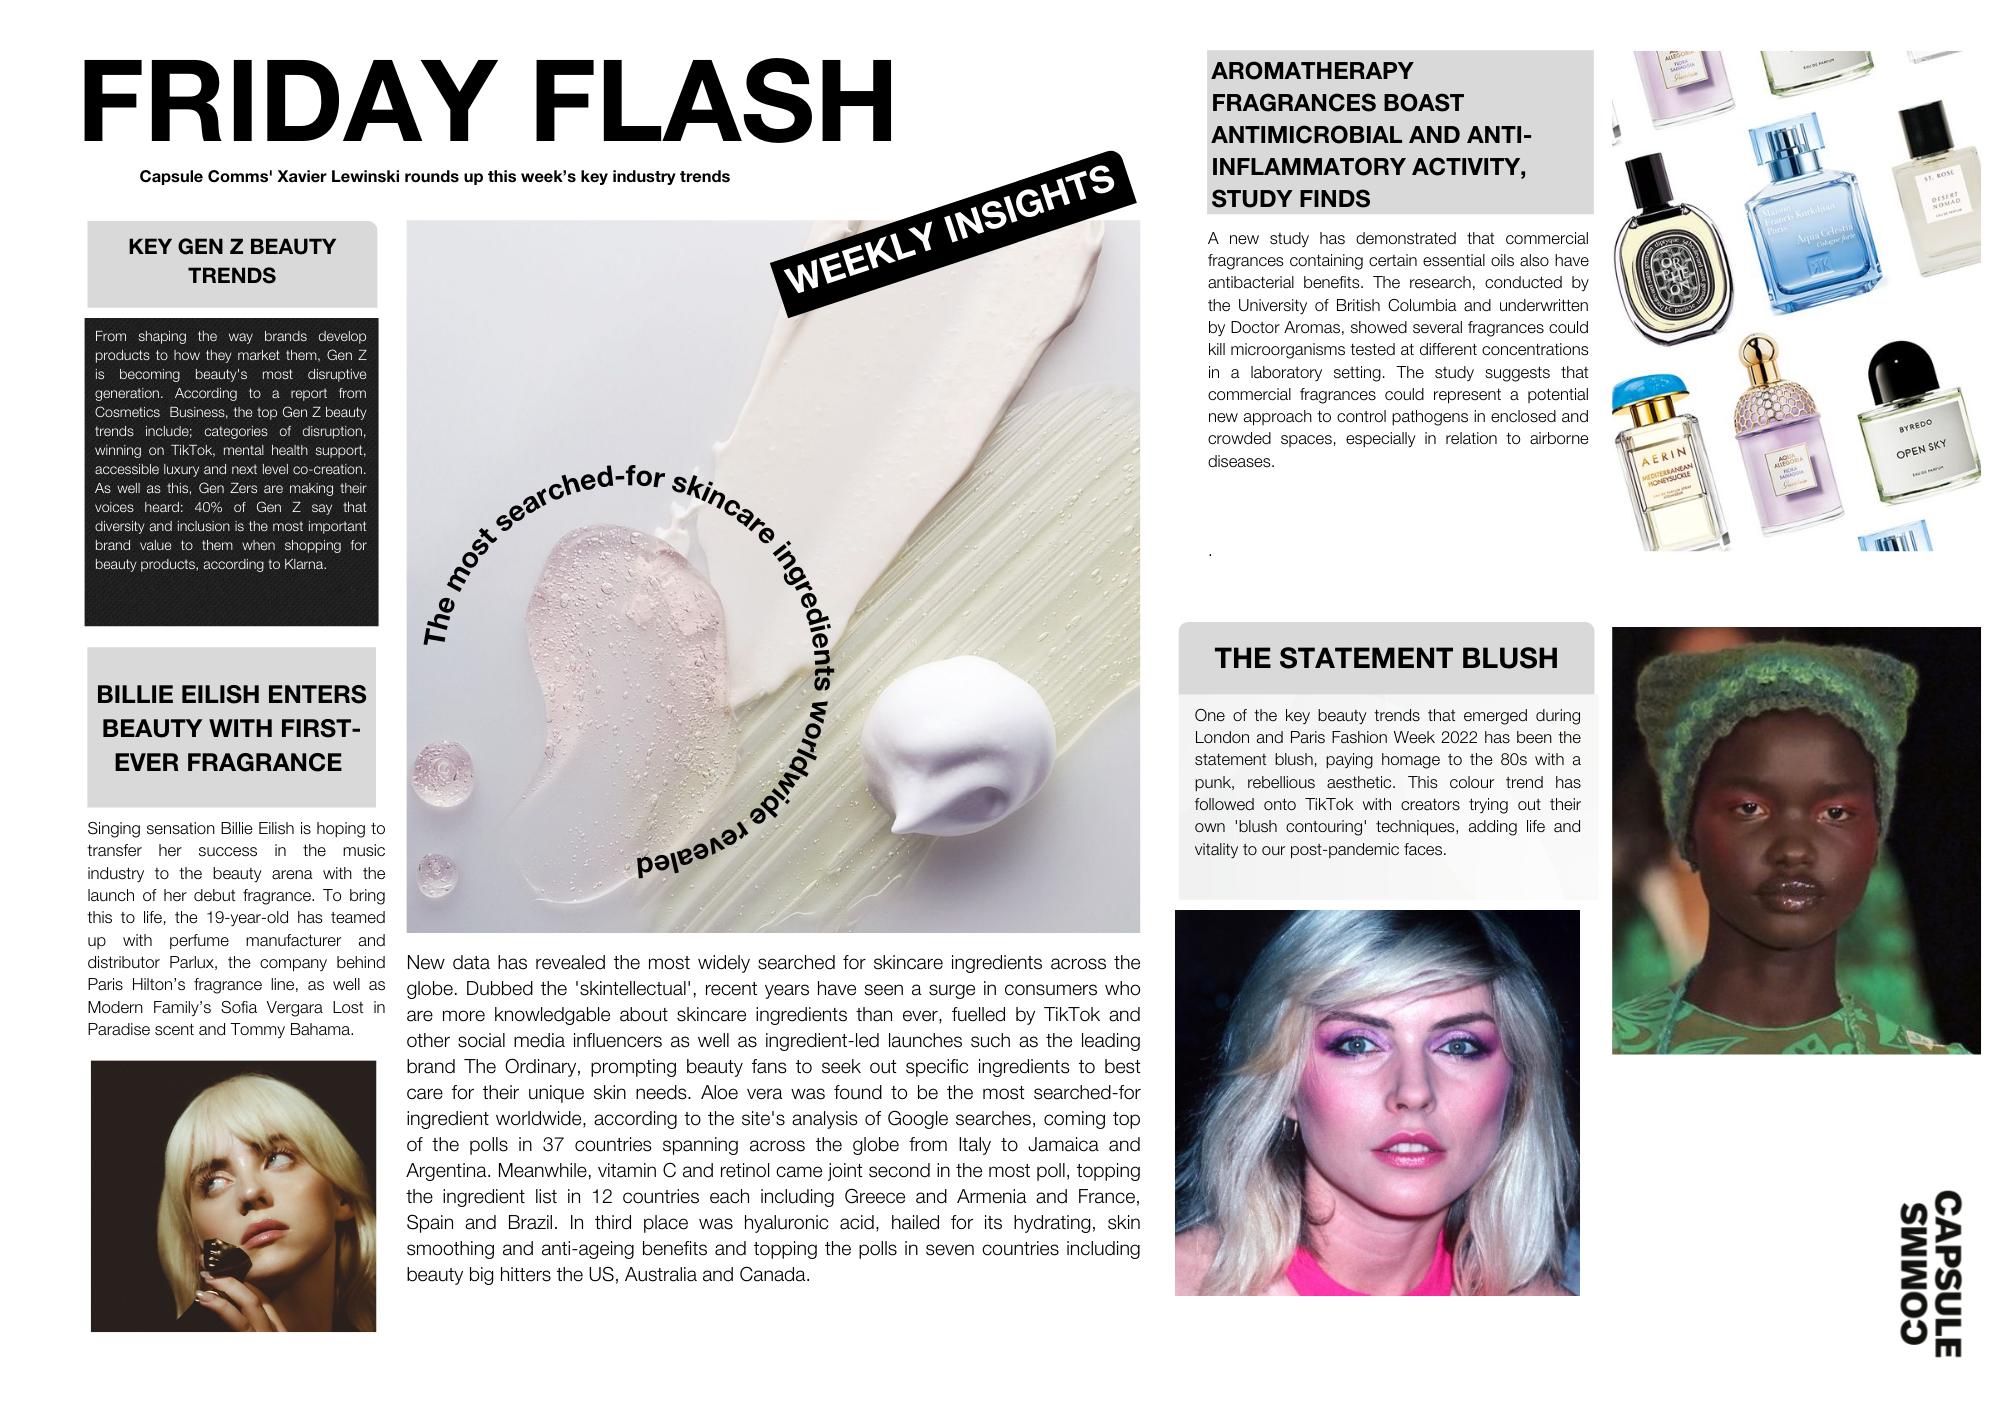 Friday Flash 22.10.21